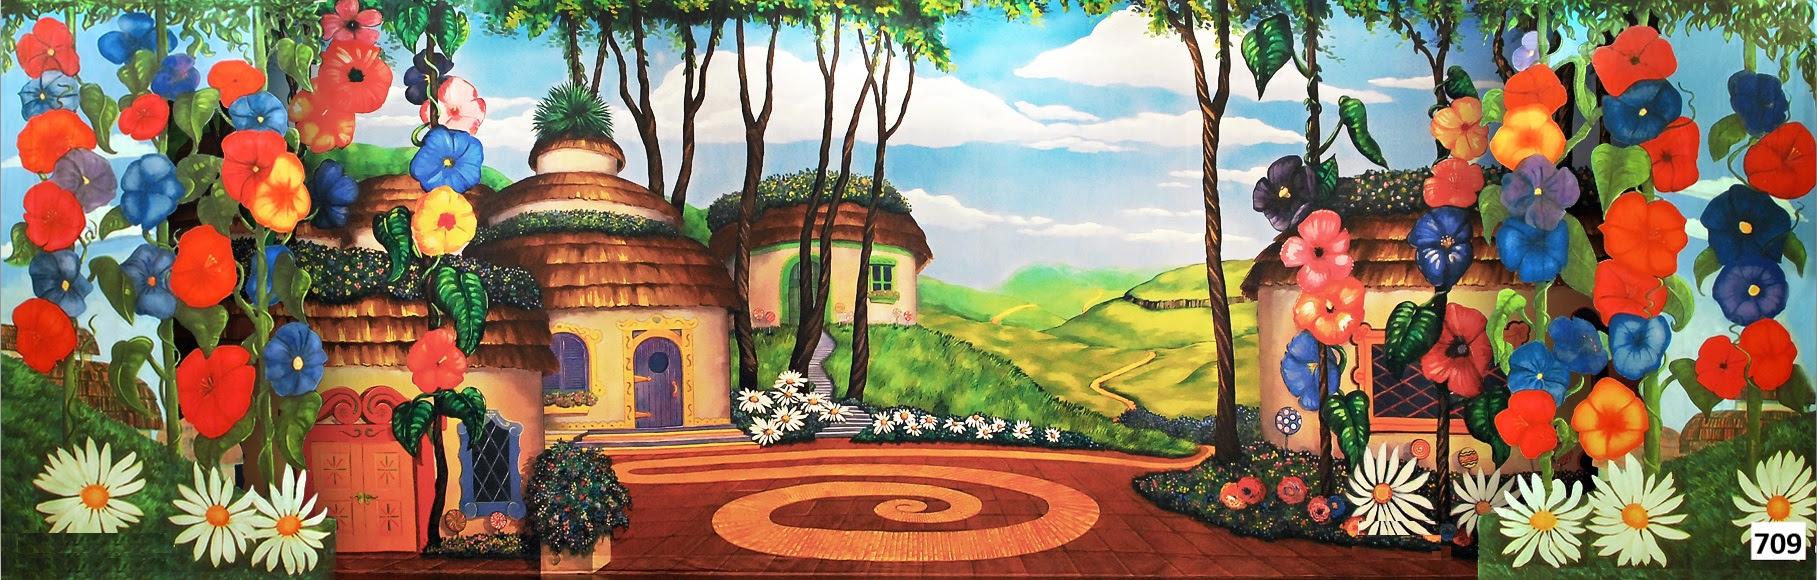 Munchkinland The Wizard Of Oz Photo 37477185 Fanpop